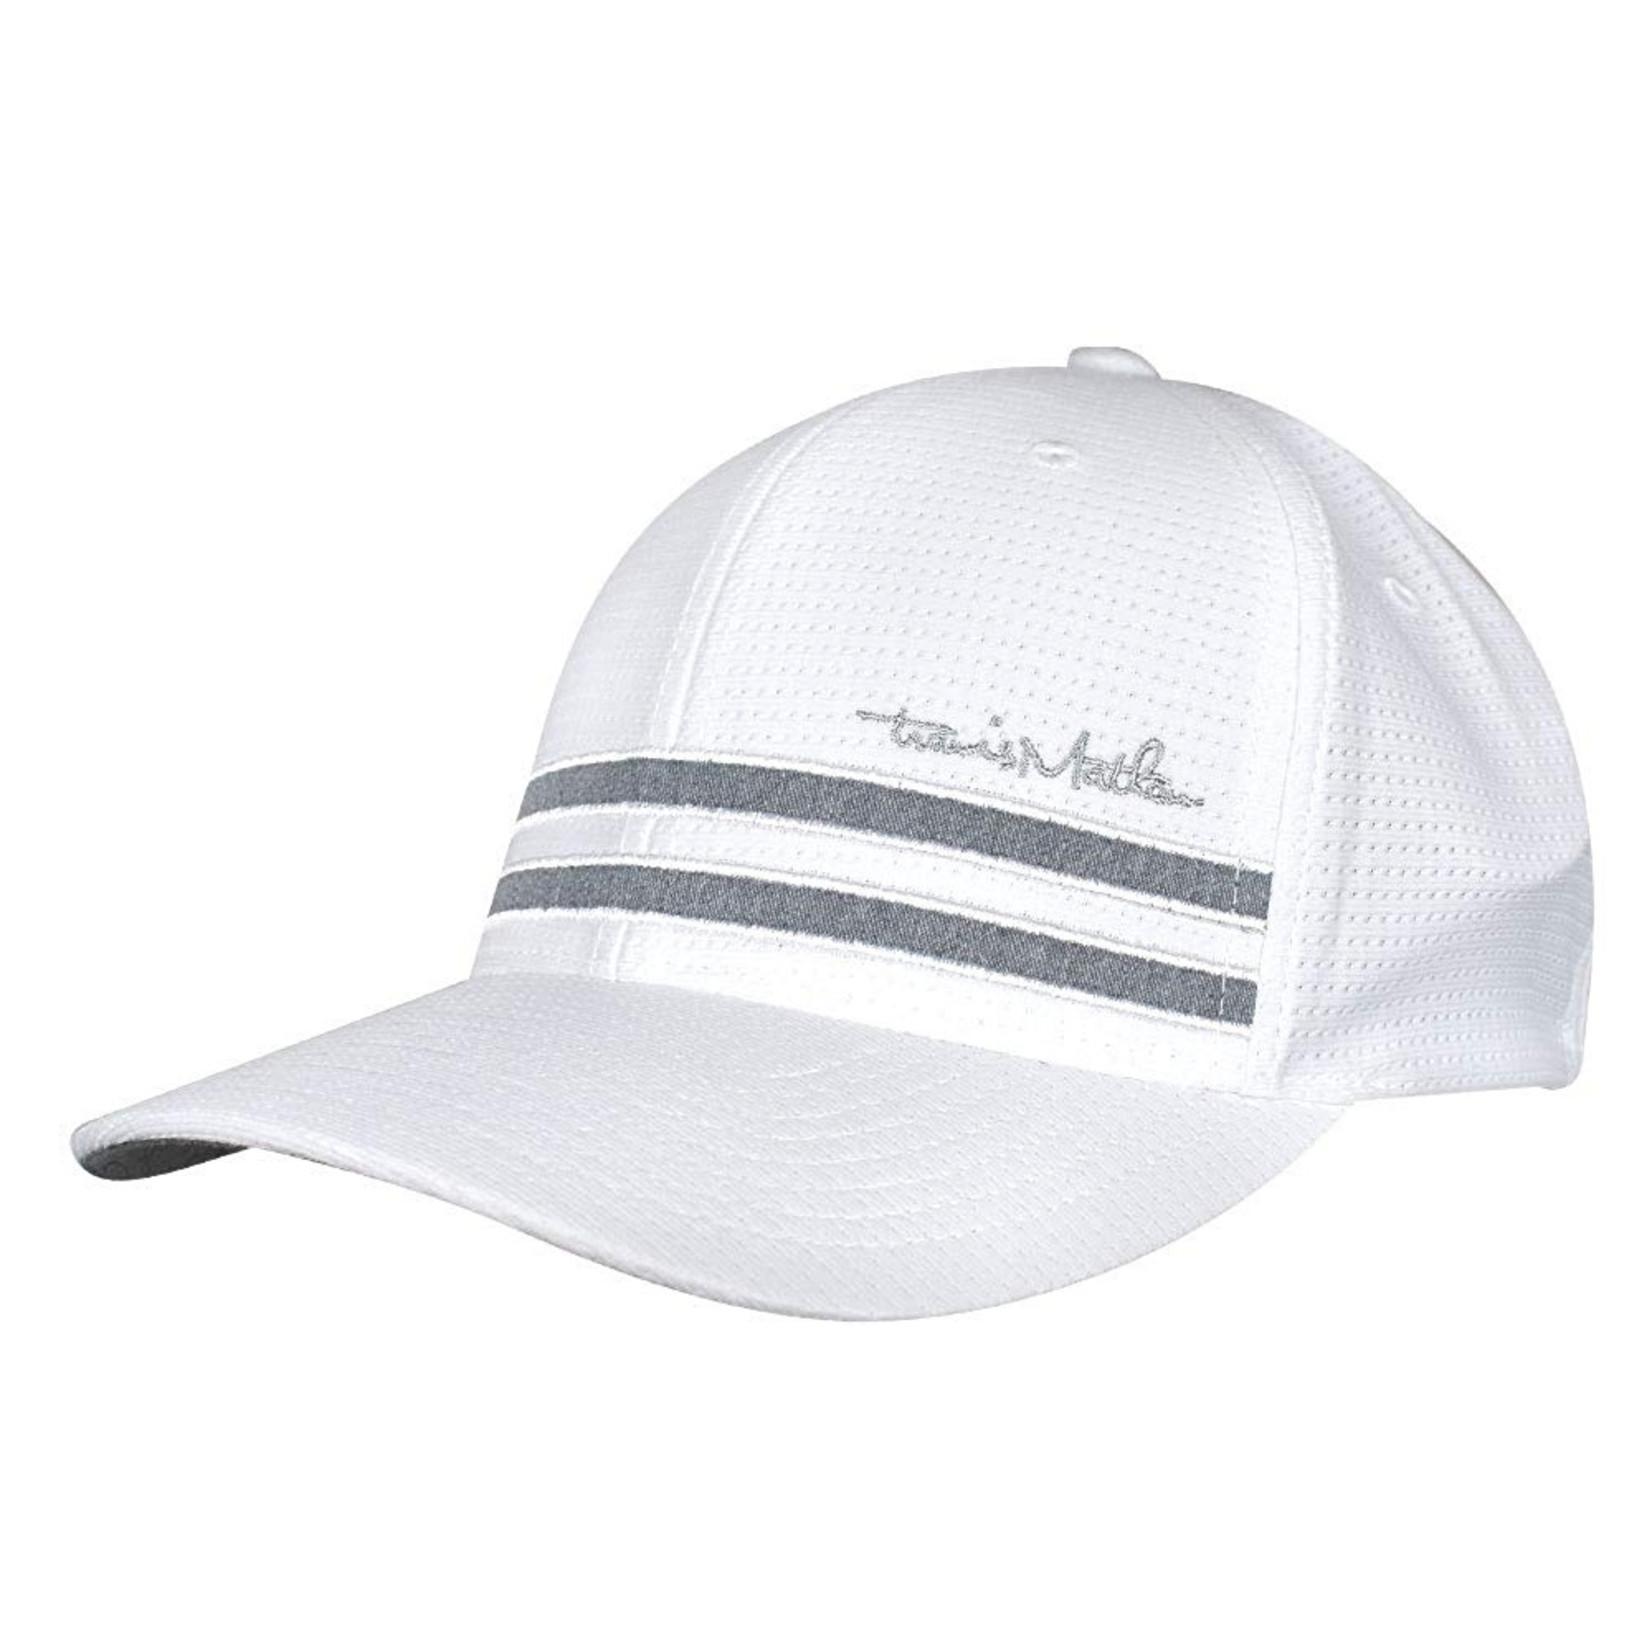 Travis Mathew TM Hout Hat Men's